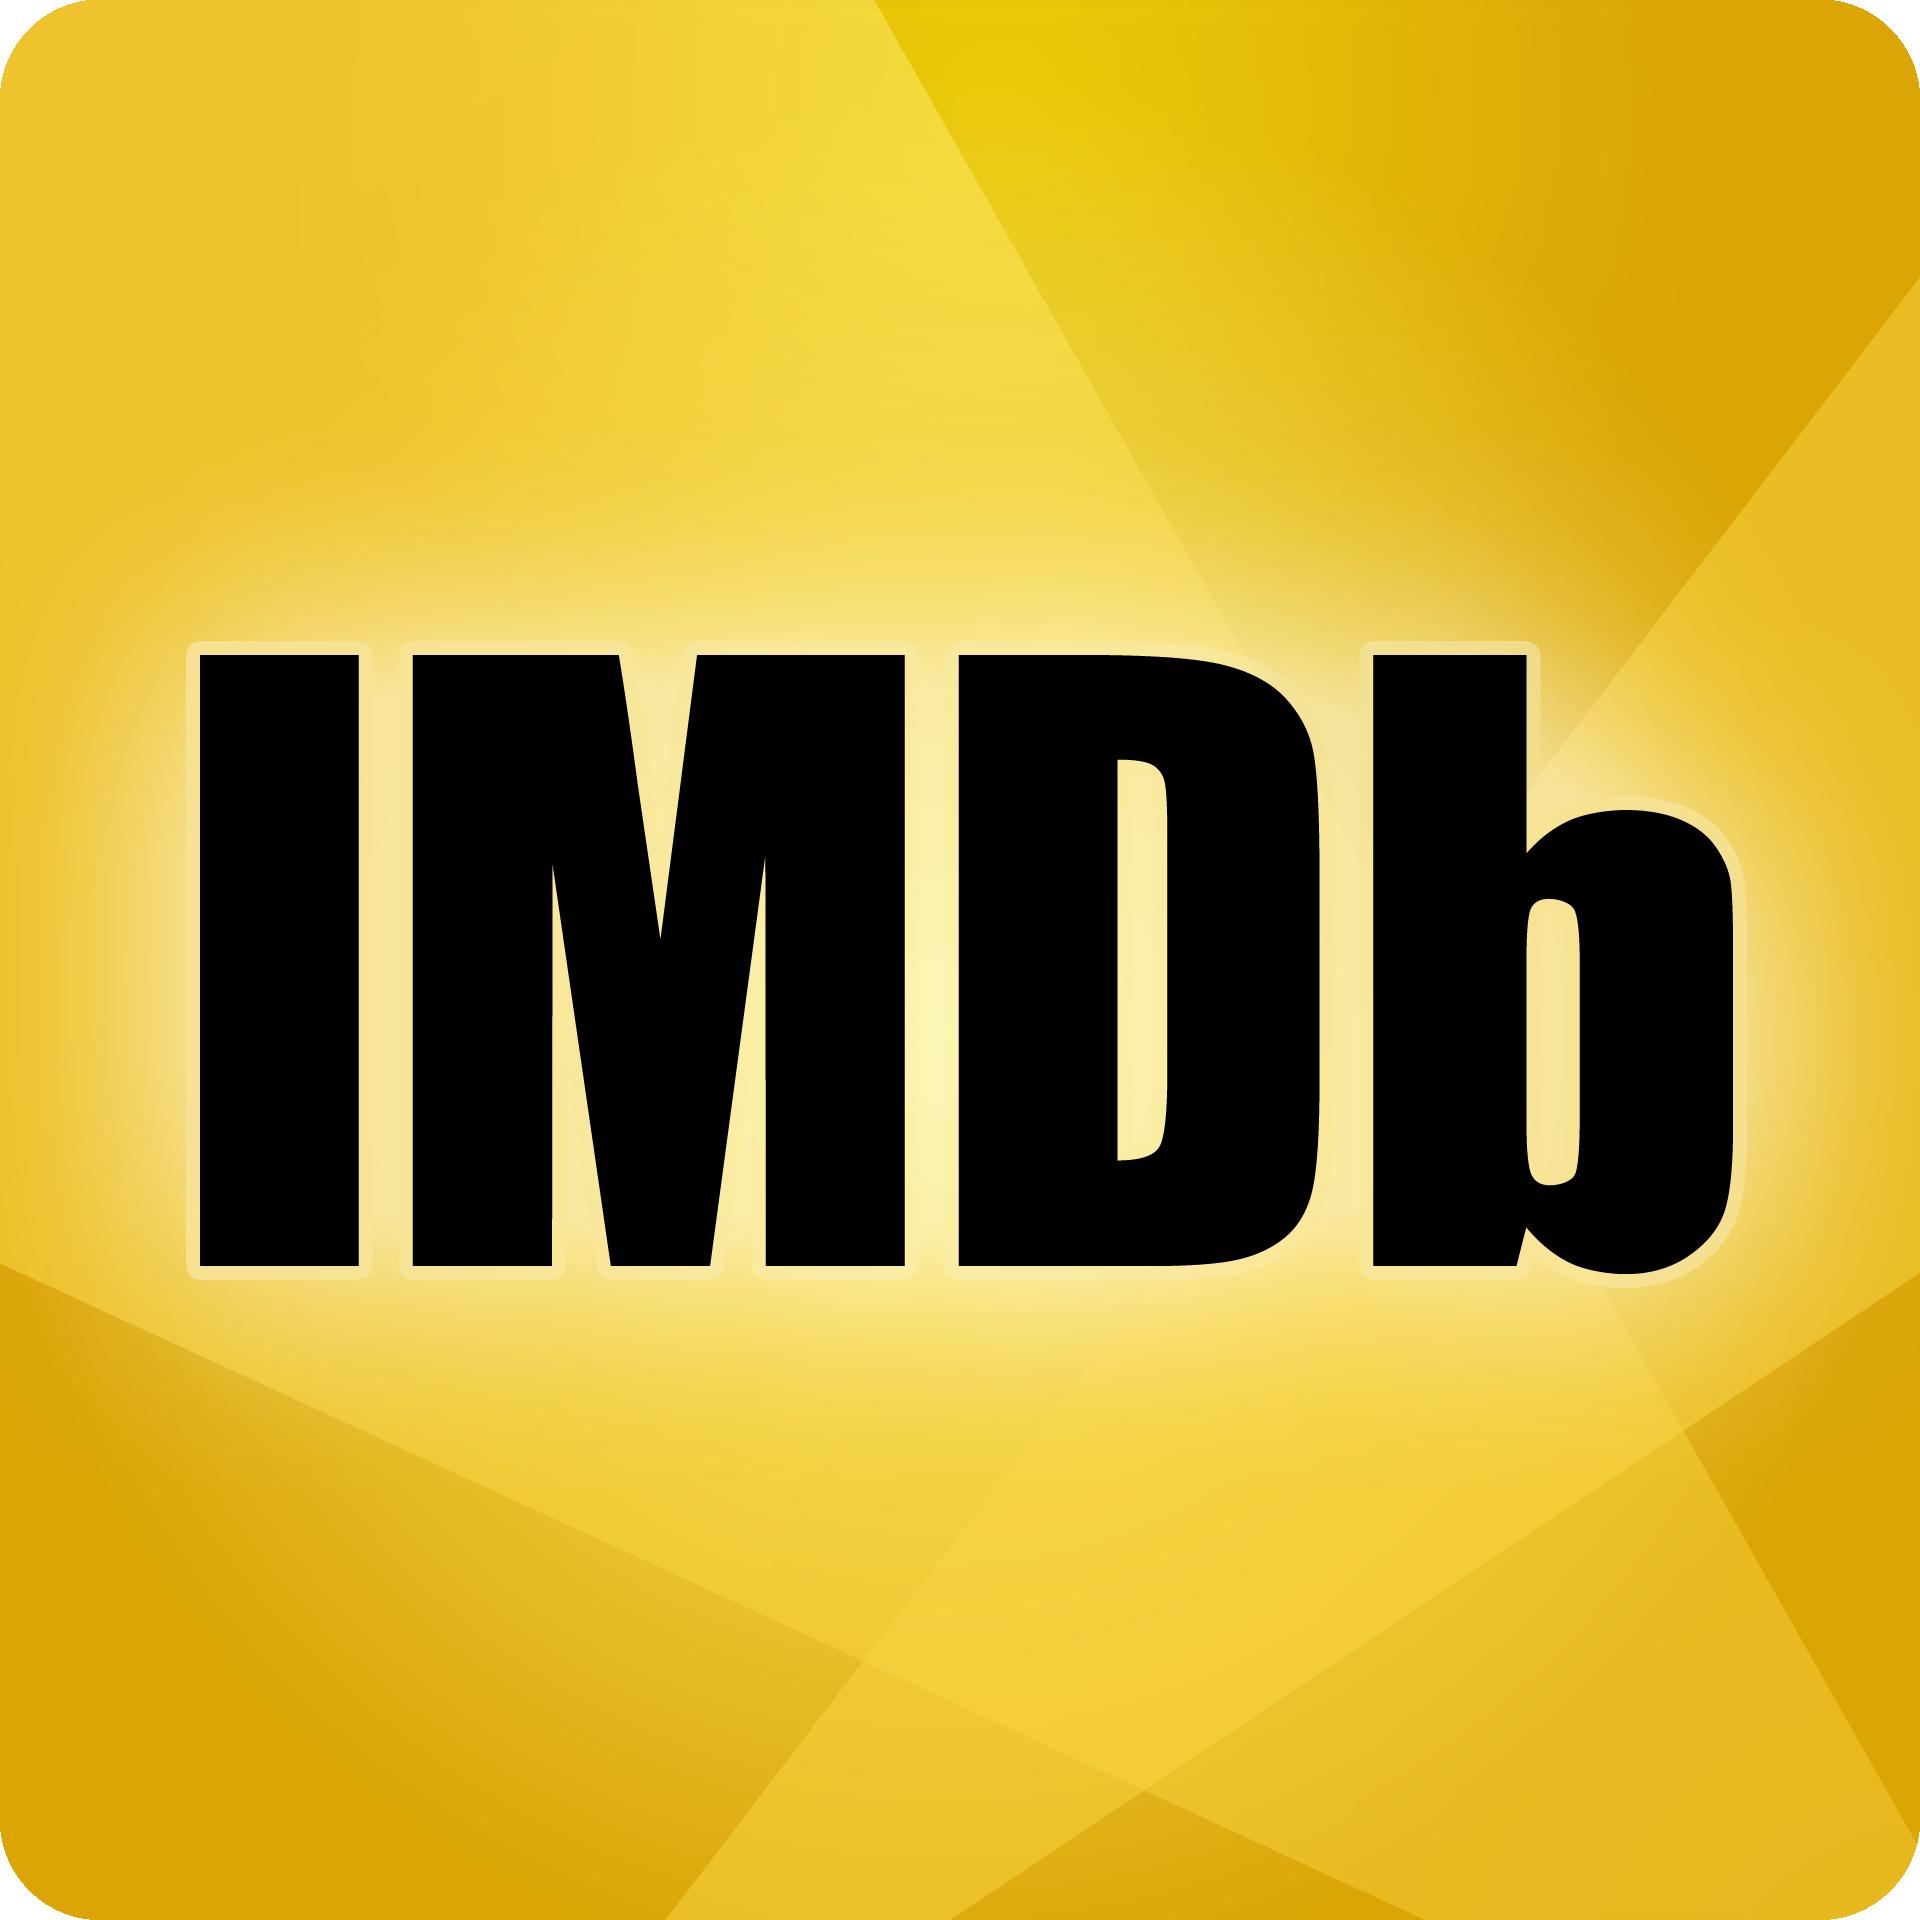 http://www.imdb.com/title/tt0799931/?ref_=ttep_ep_tt